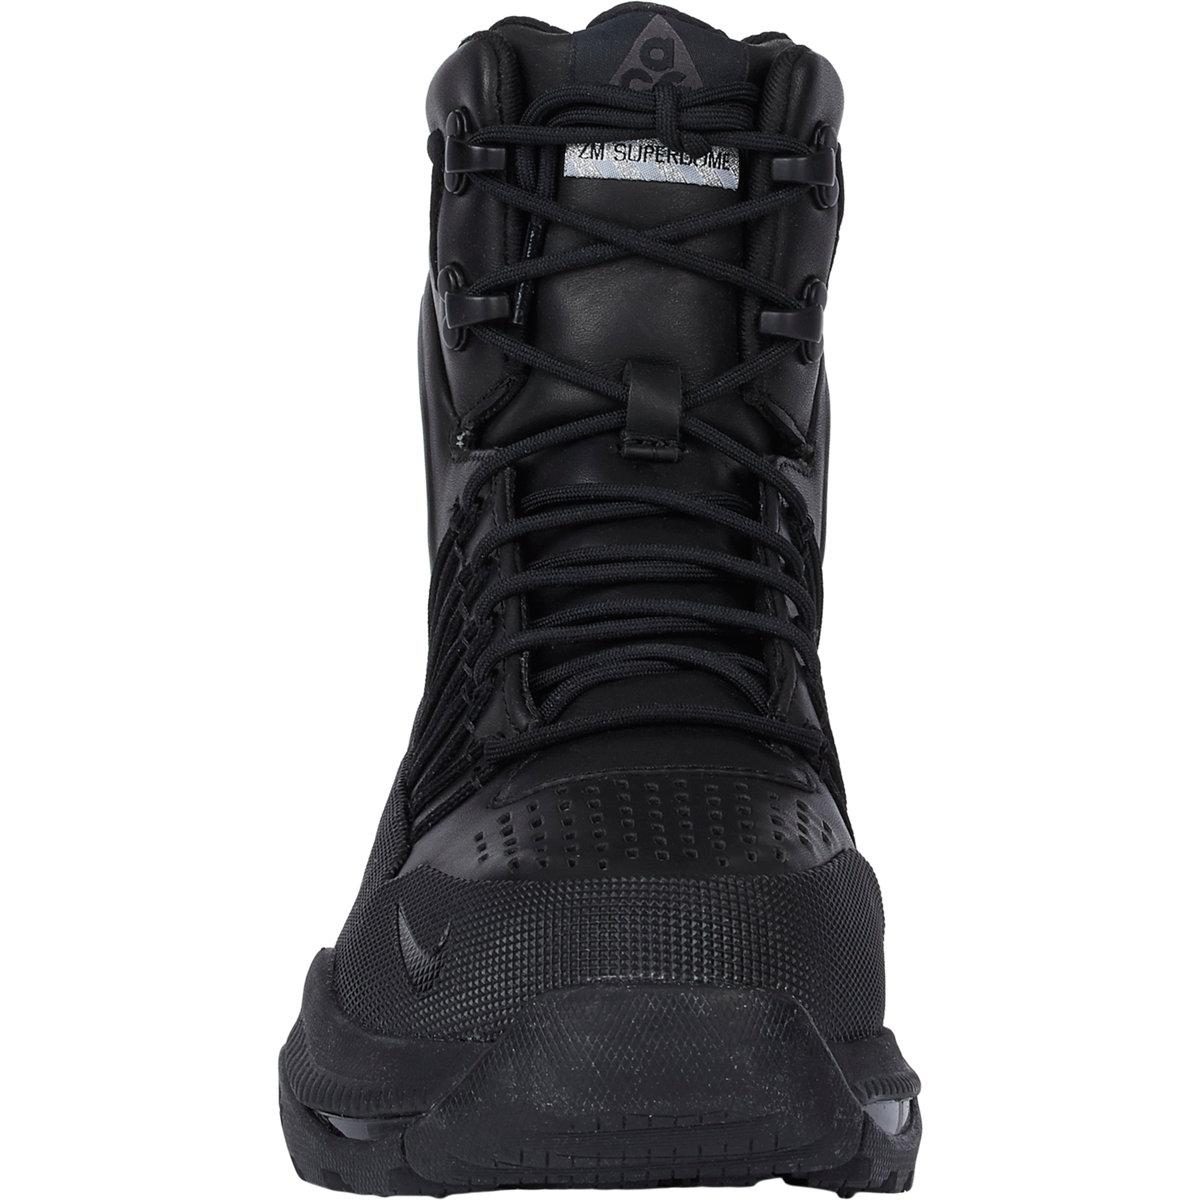 fb425980d07 Nike Black Zoom Superdome Boots for men